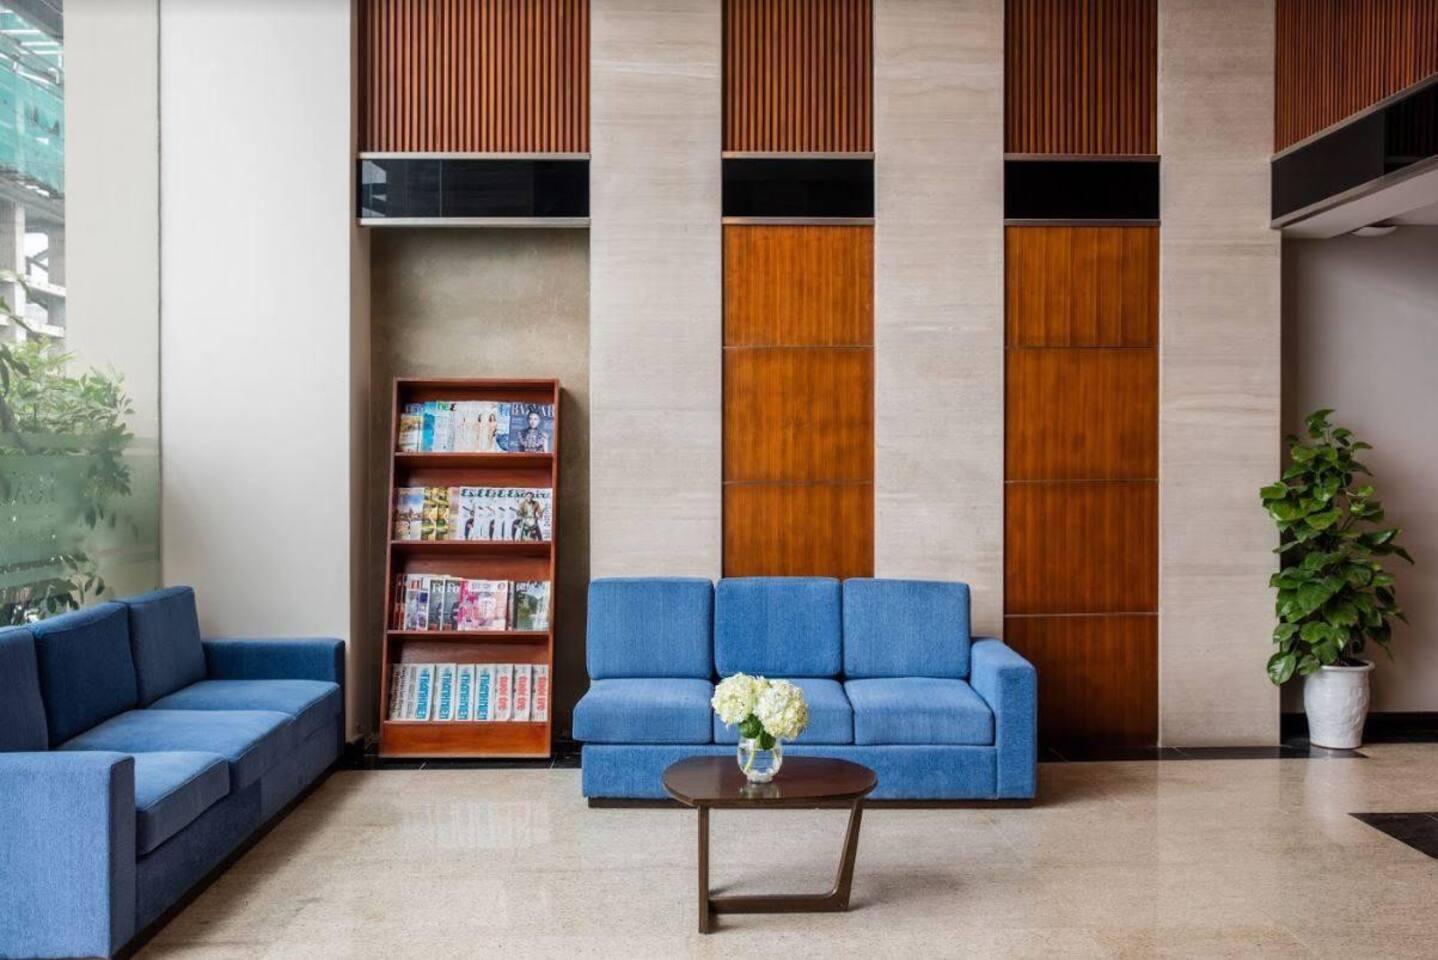 Altara Suites by Sheraton (30th floor) photo 18207047